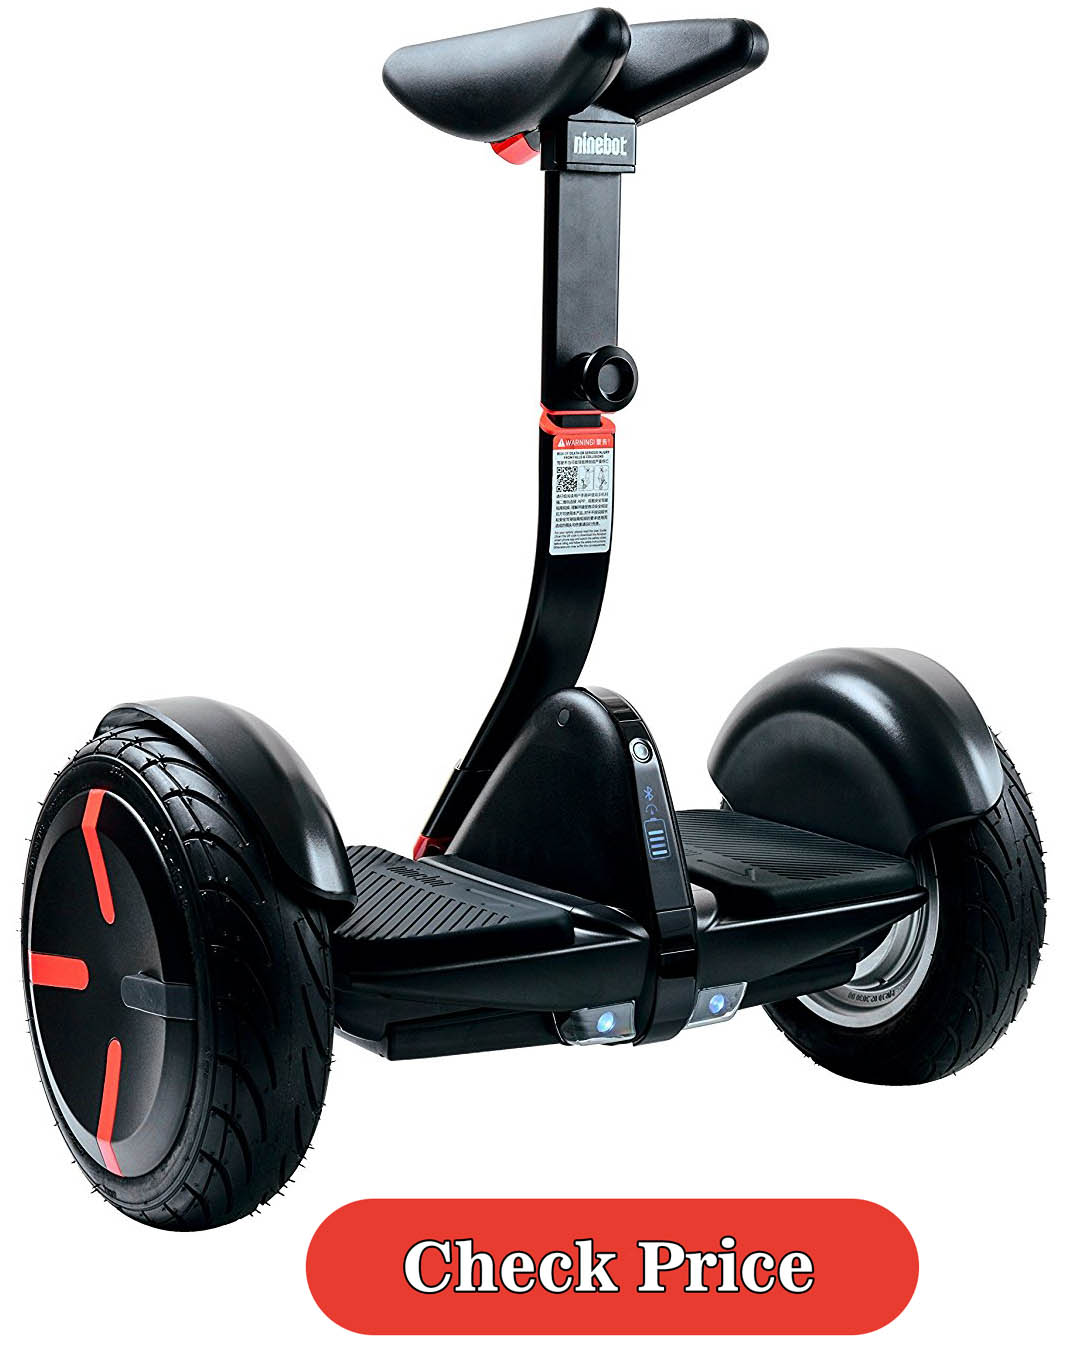 Segway mini PRO safest hoverboard